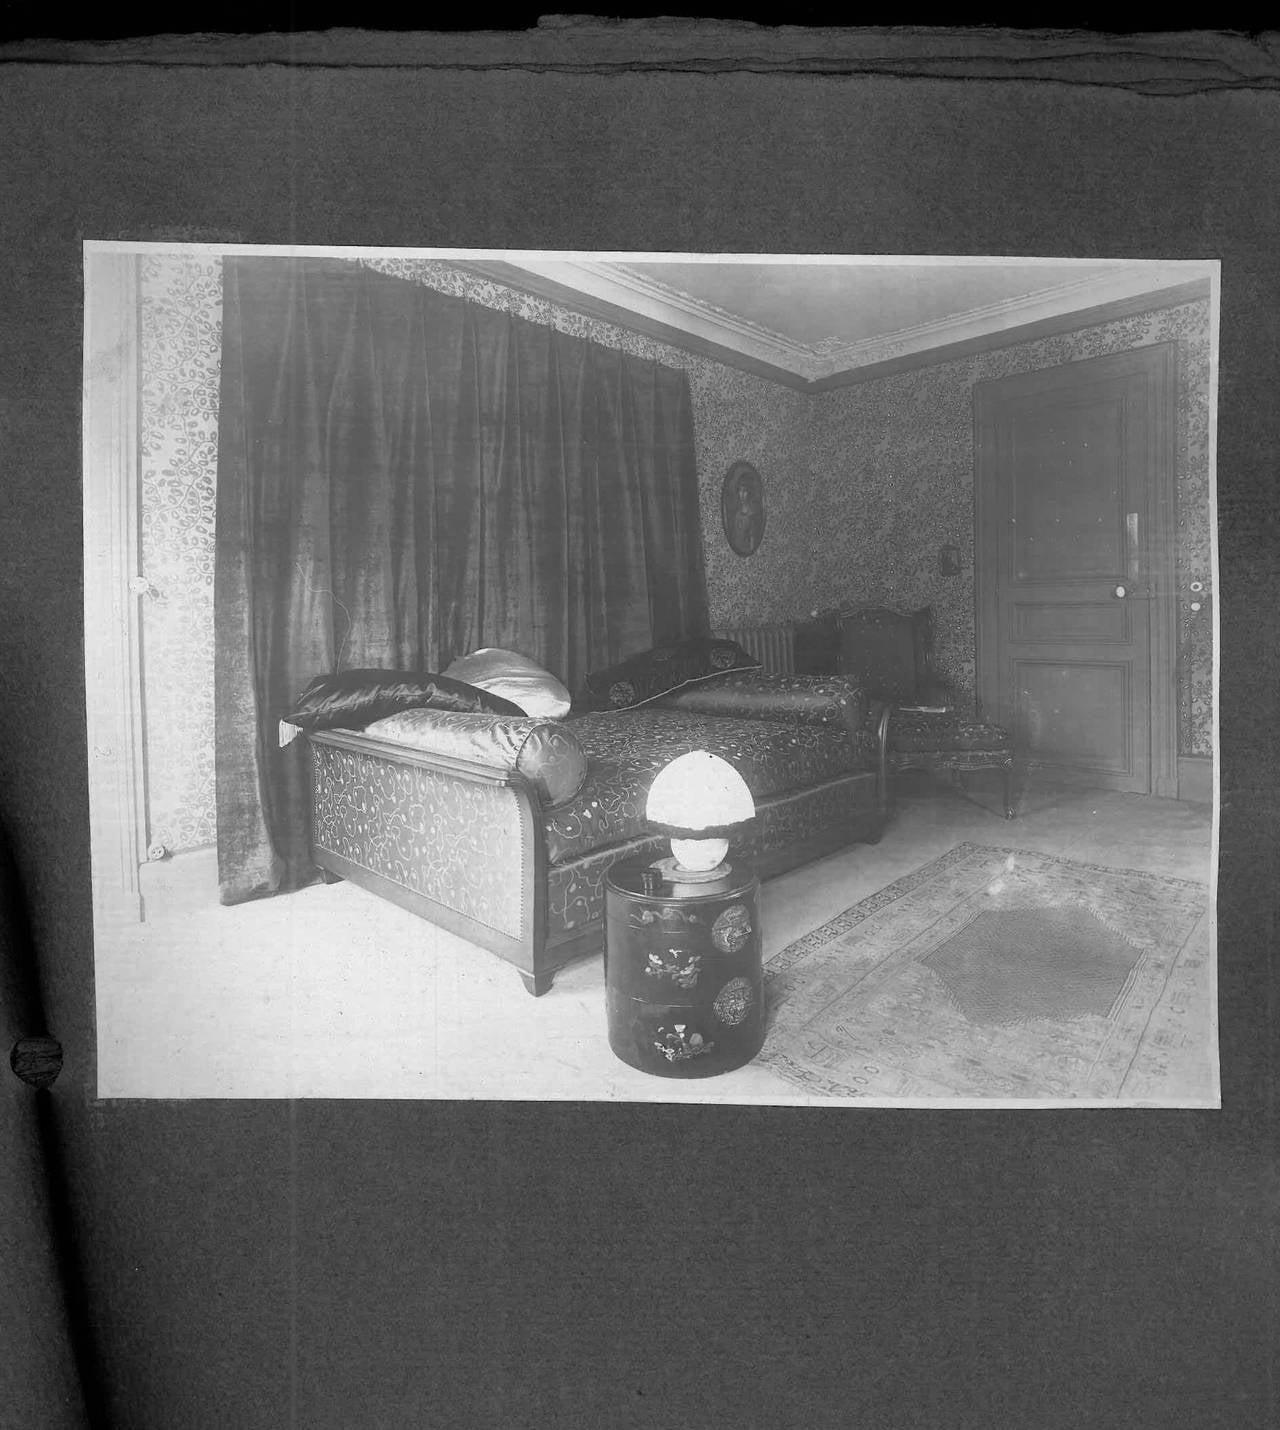 20th Century Ruhlmann Vintage Photograph Album For Sale